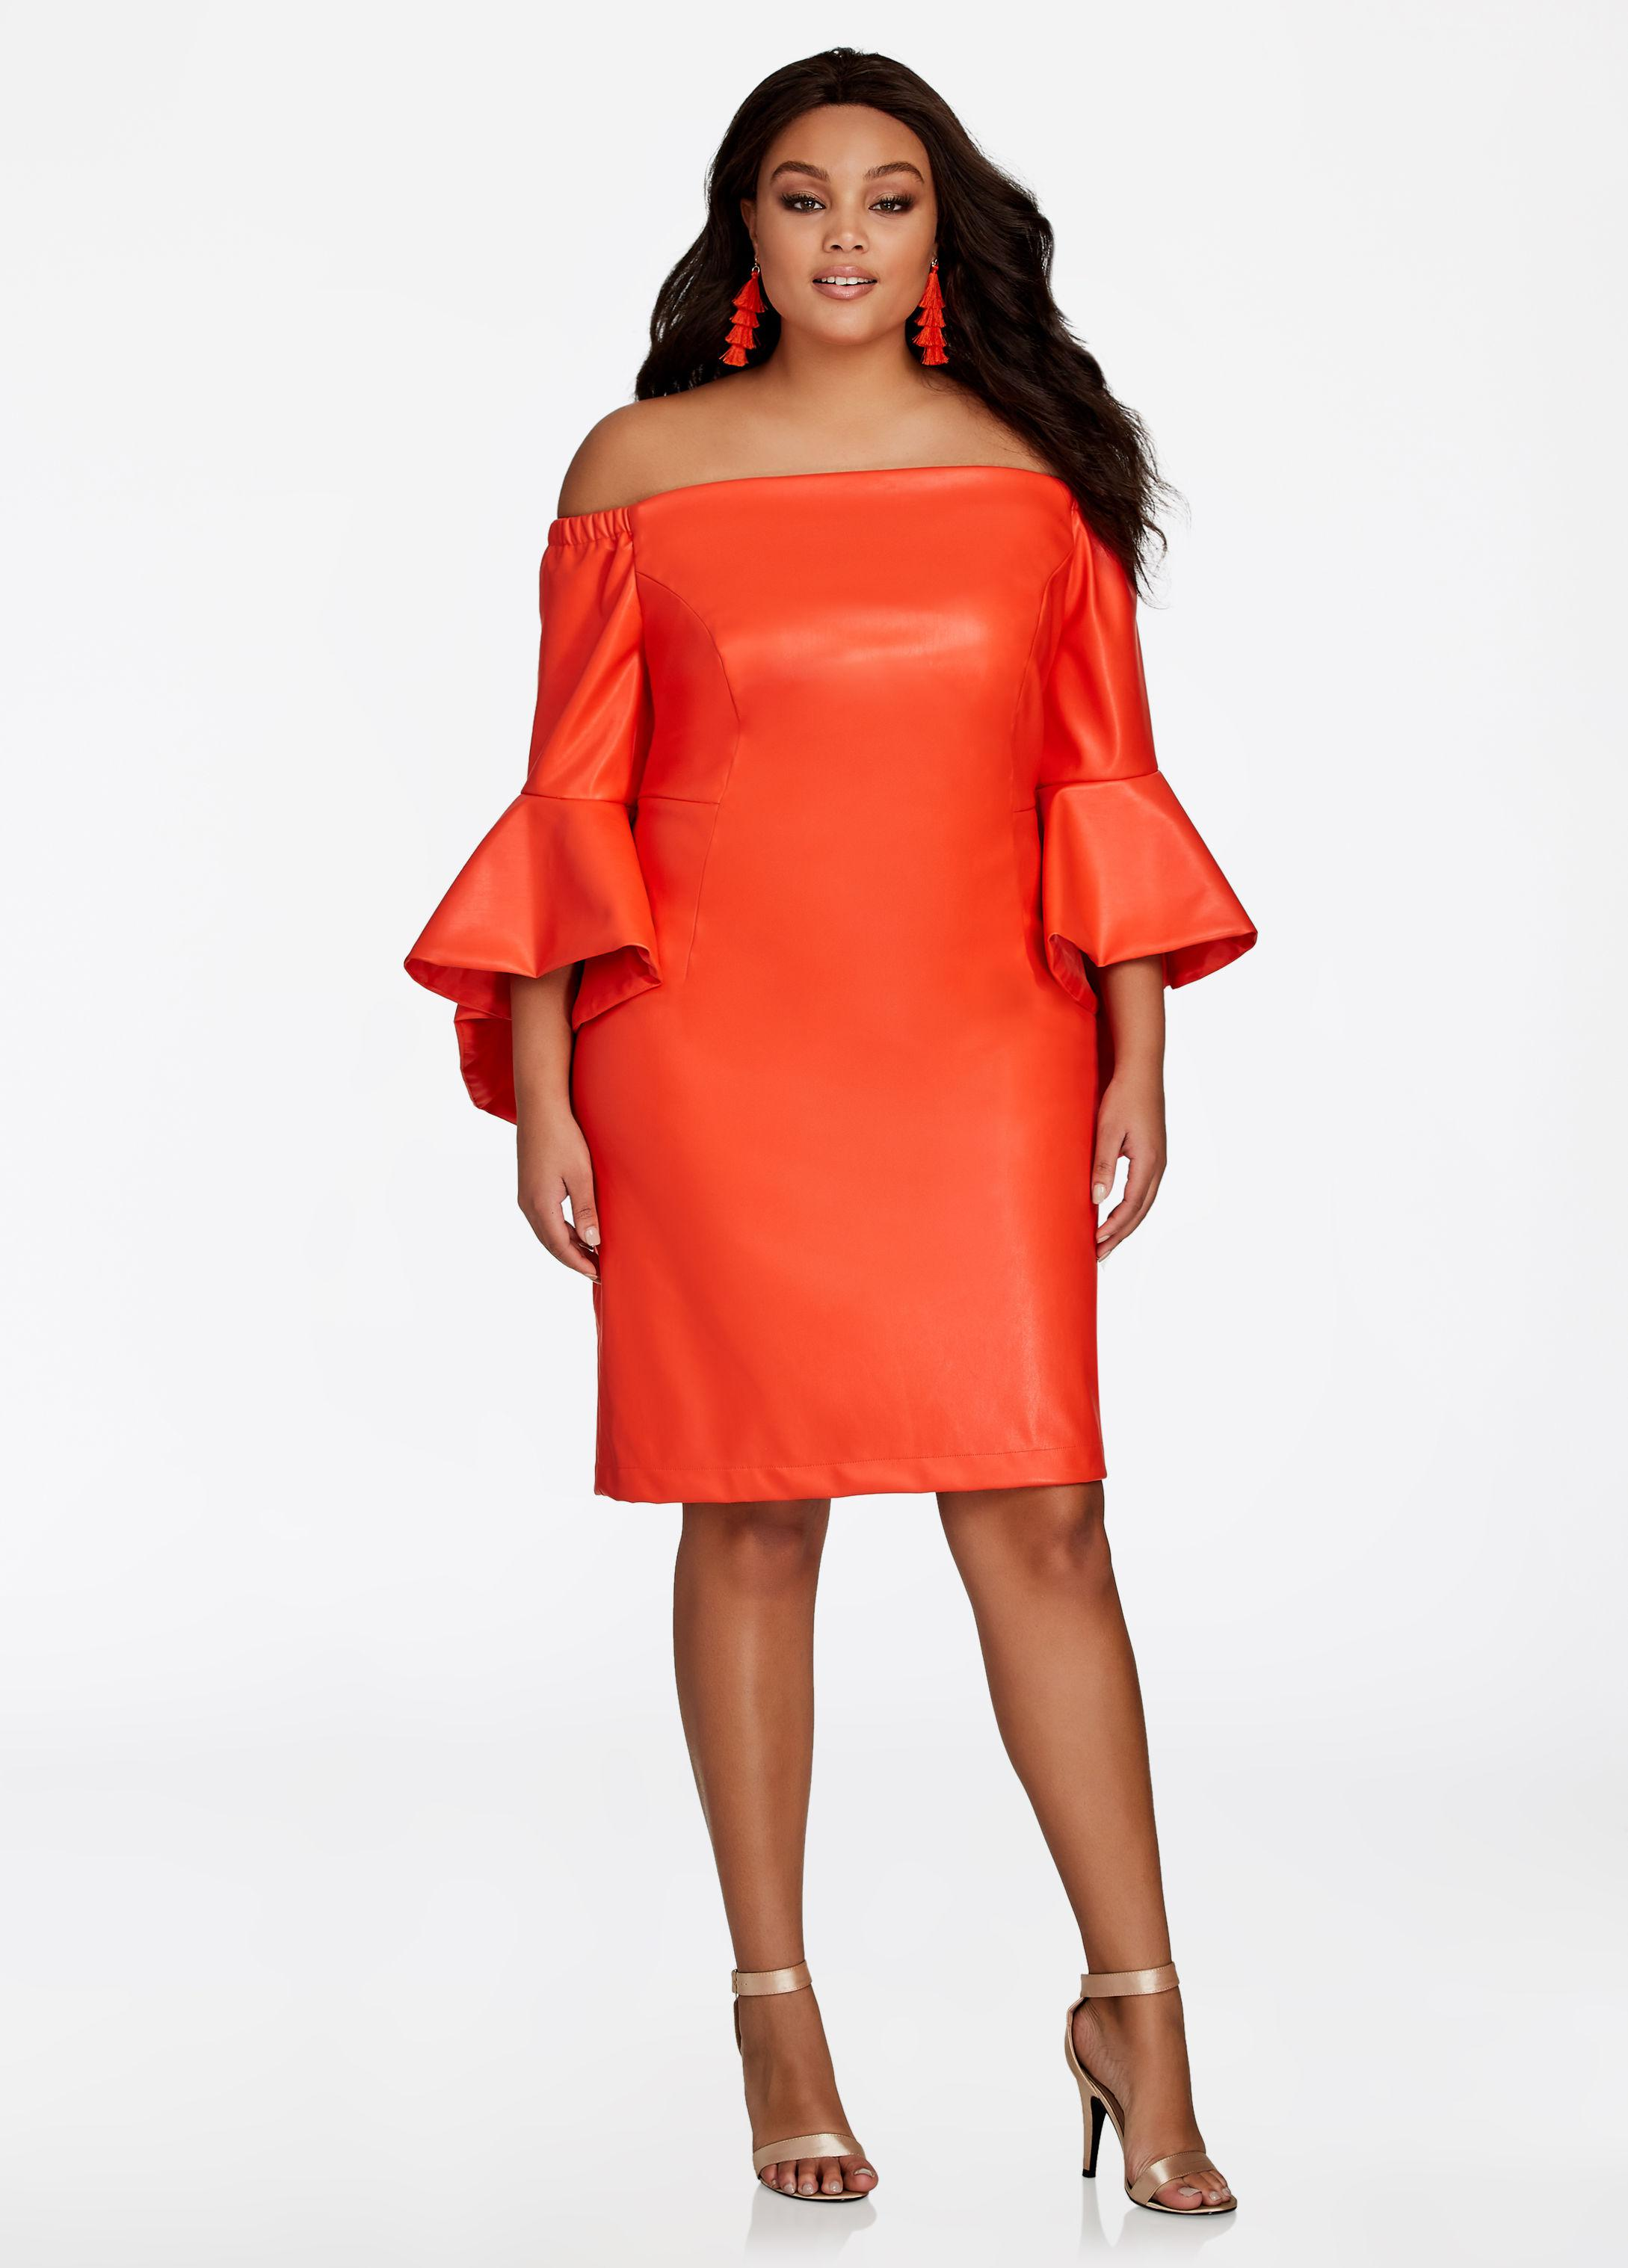 Lyst - Ashley Stewart Off Shoulder Faux Leather Dress in Orange